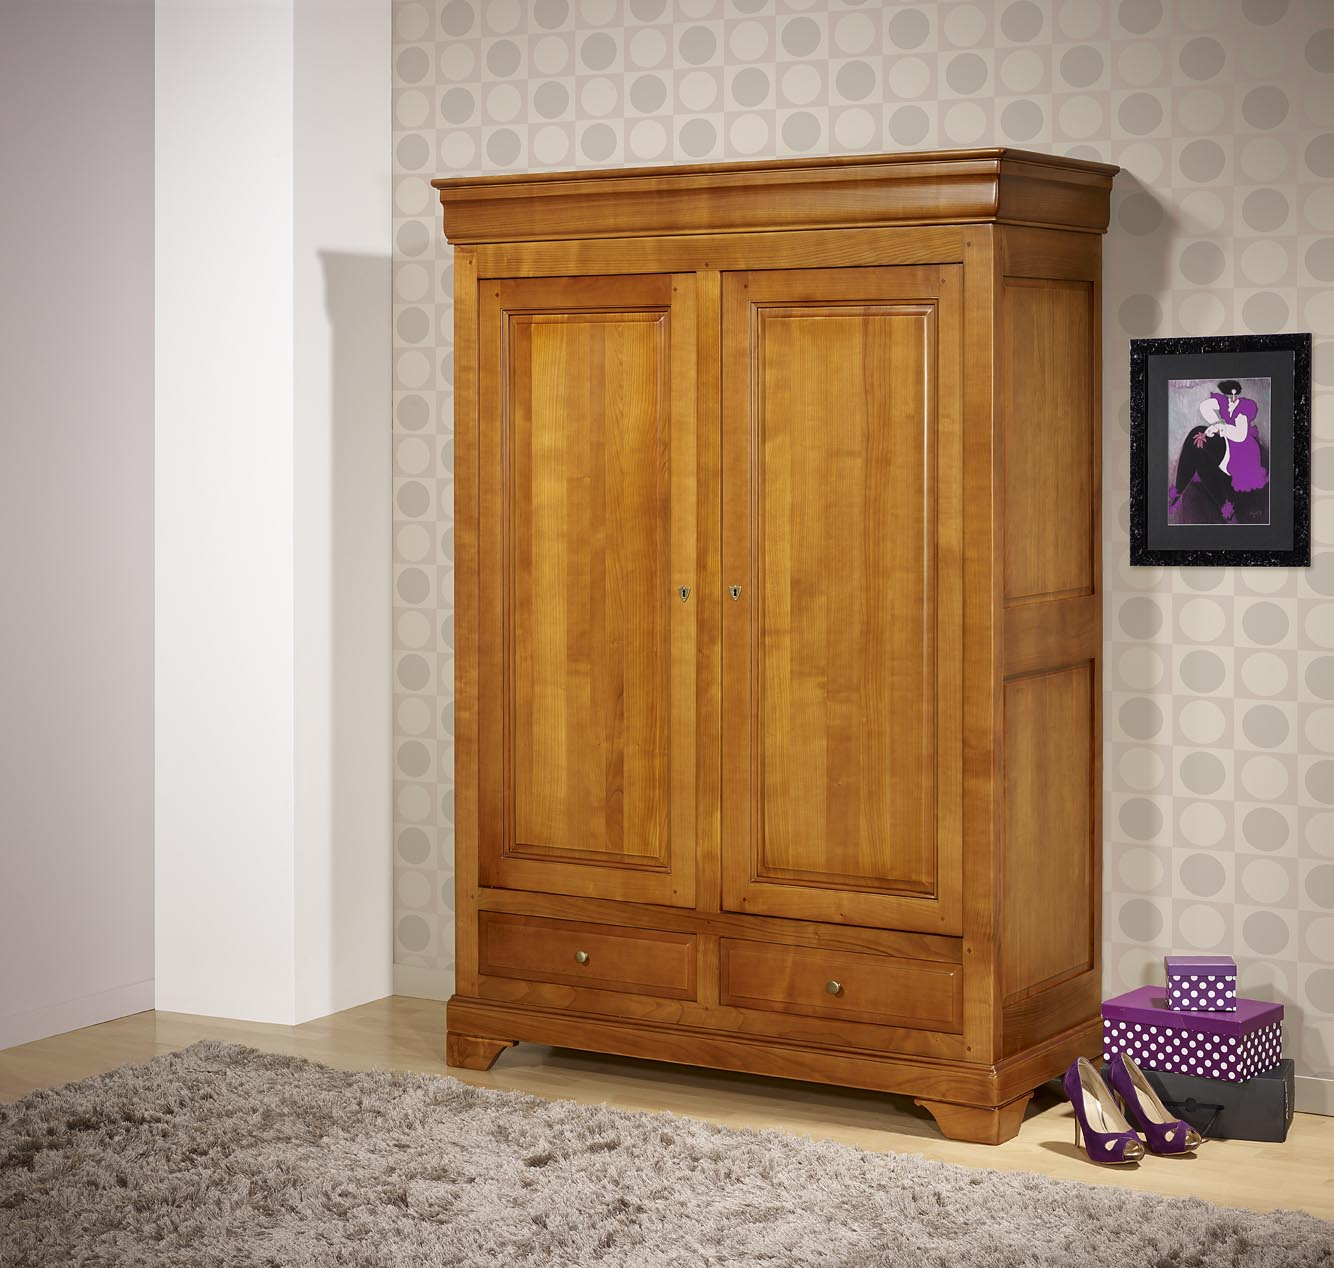 petite armoire 2 portes 2 tiroirs ines en merisier massif de style louis philippe meuble en merisier massif